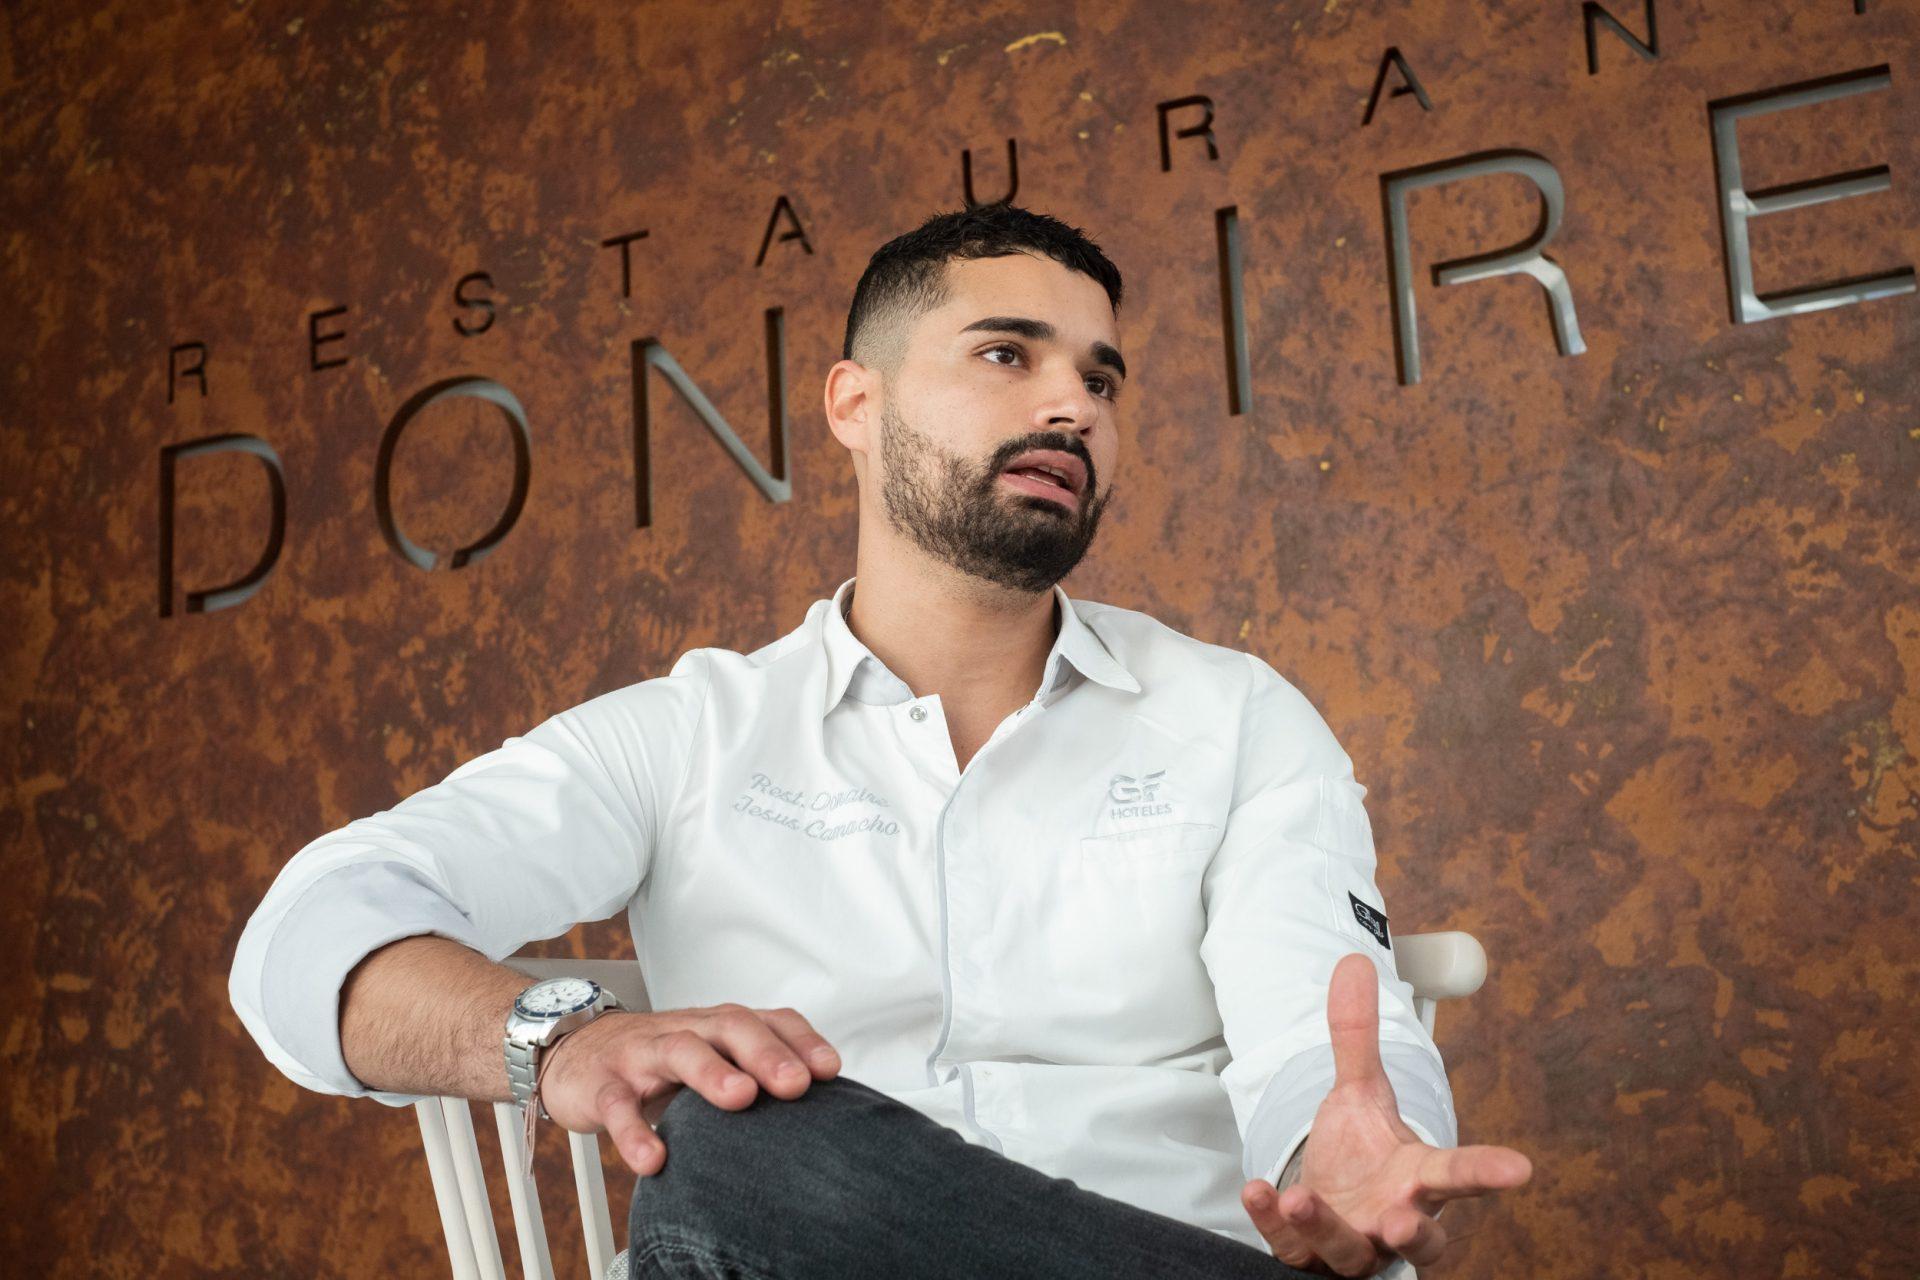 Jesús Camacho, chef pastelero de Donaire. Fran Pallero